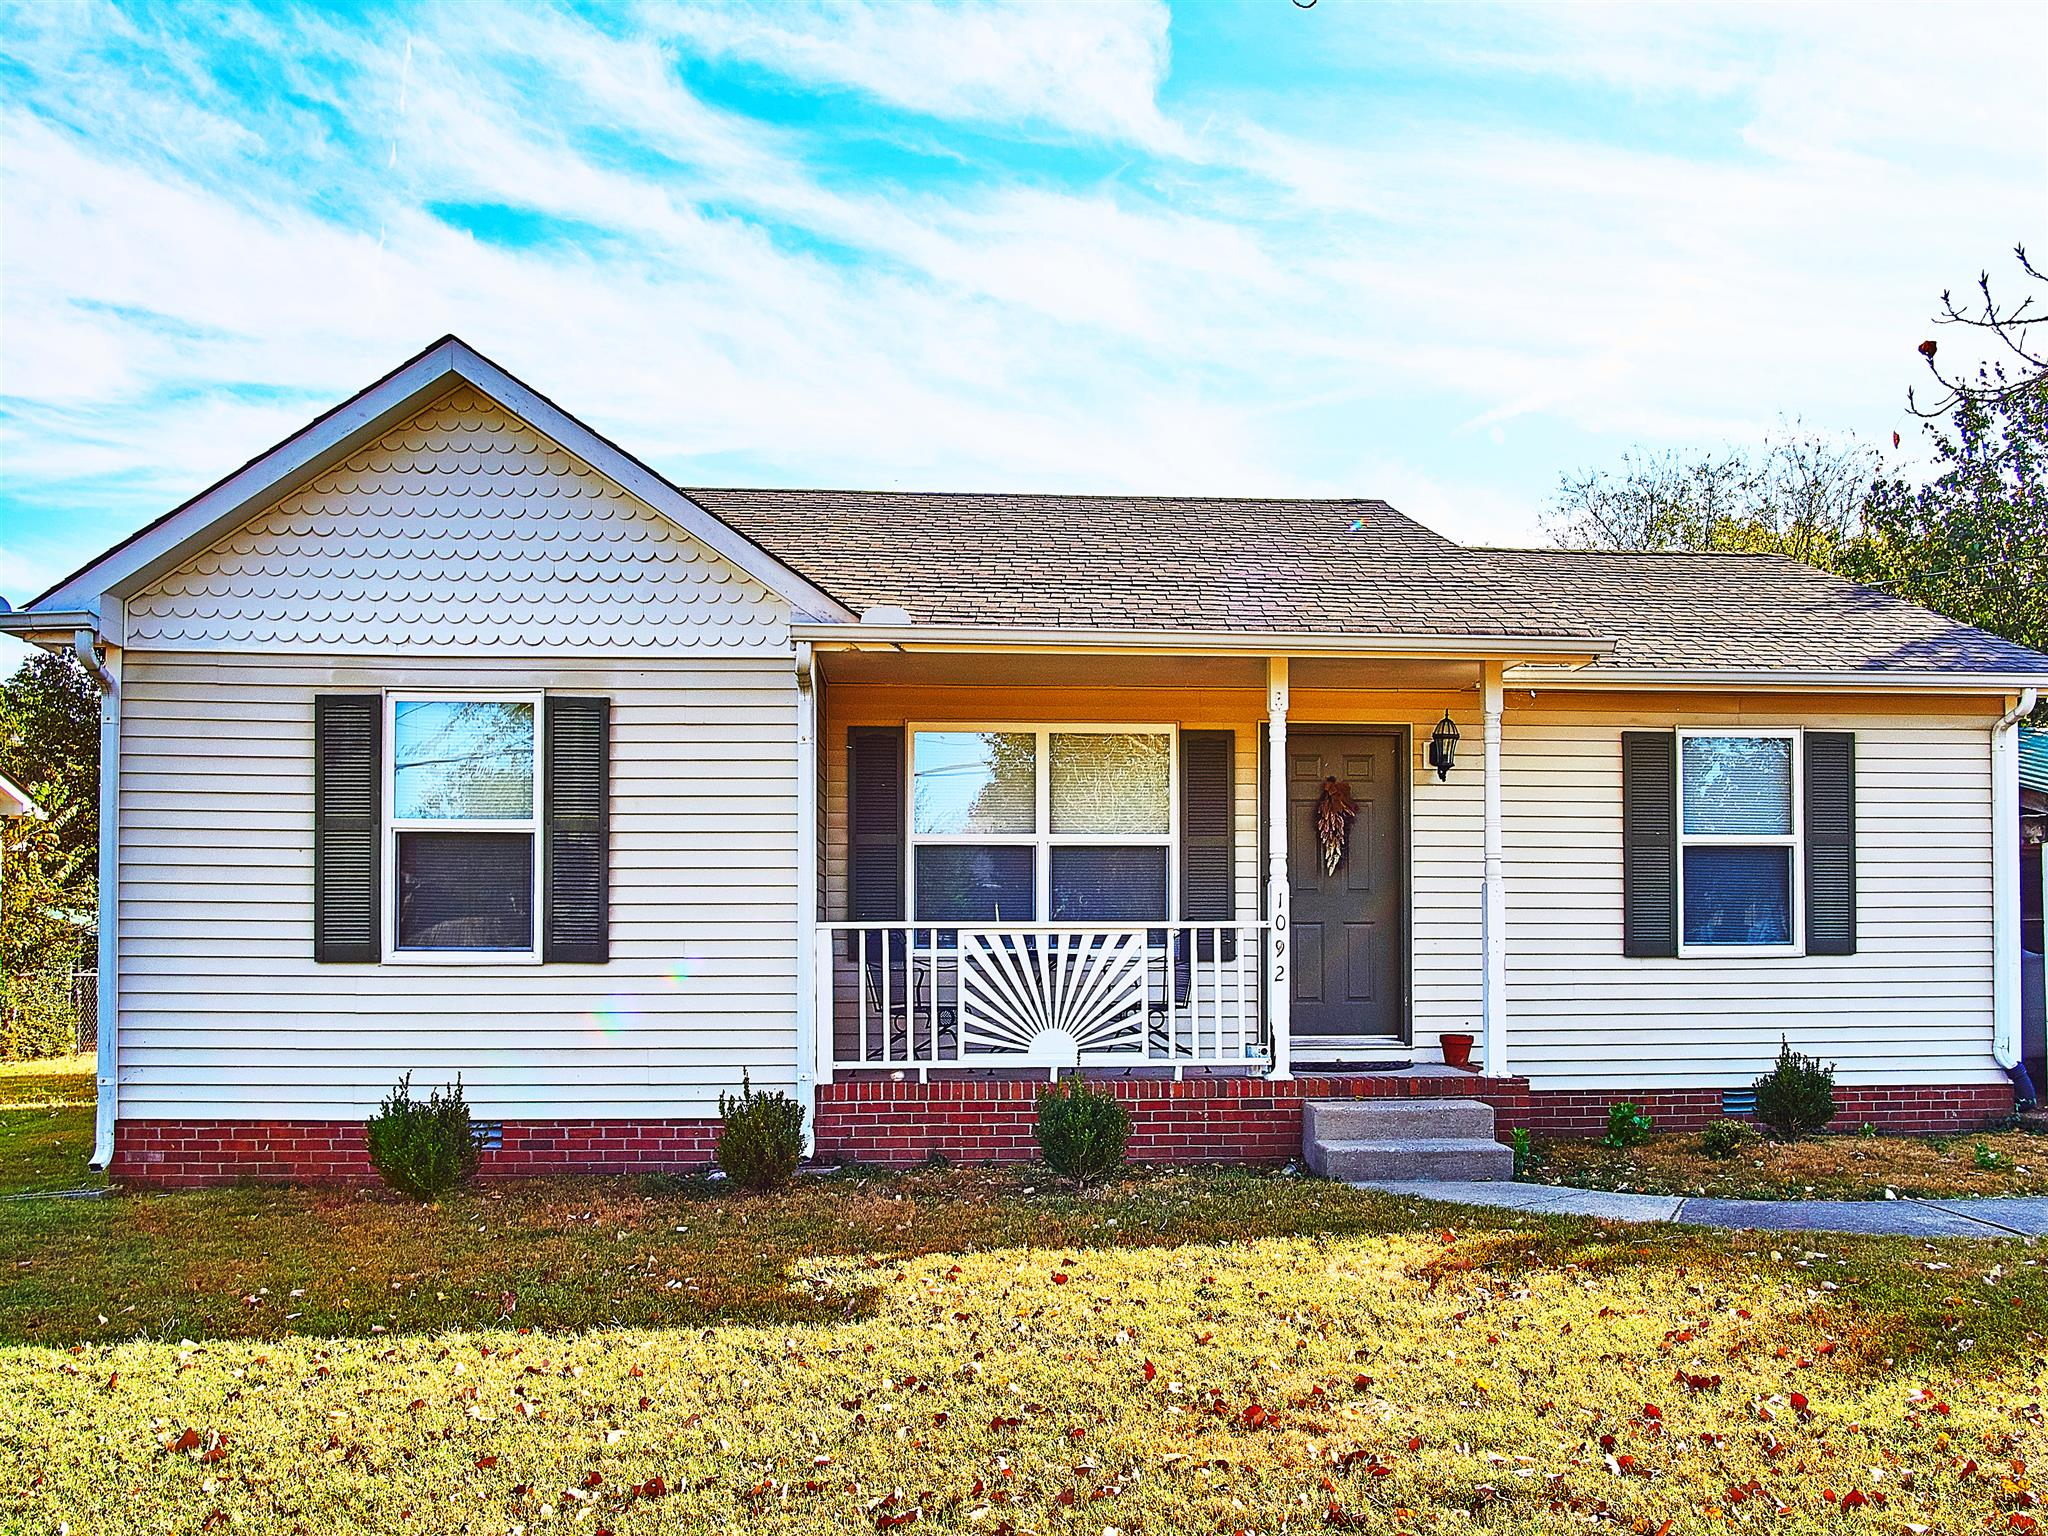 1092 Moss Trl, LA VERGNE, TN 37086 - LA VERGNE, TN real estate listing